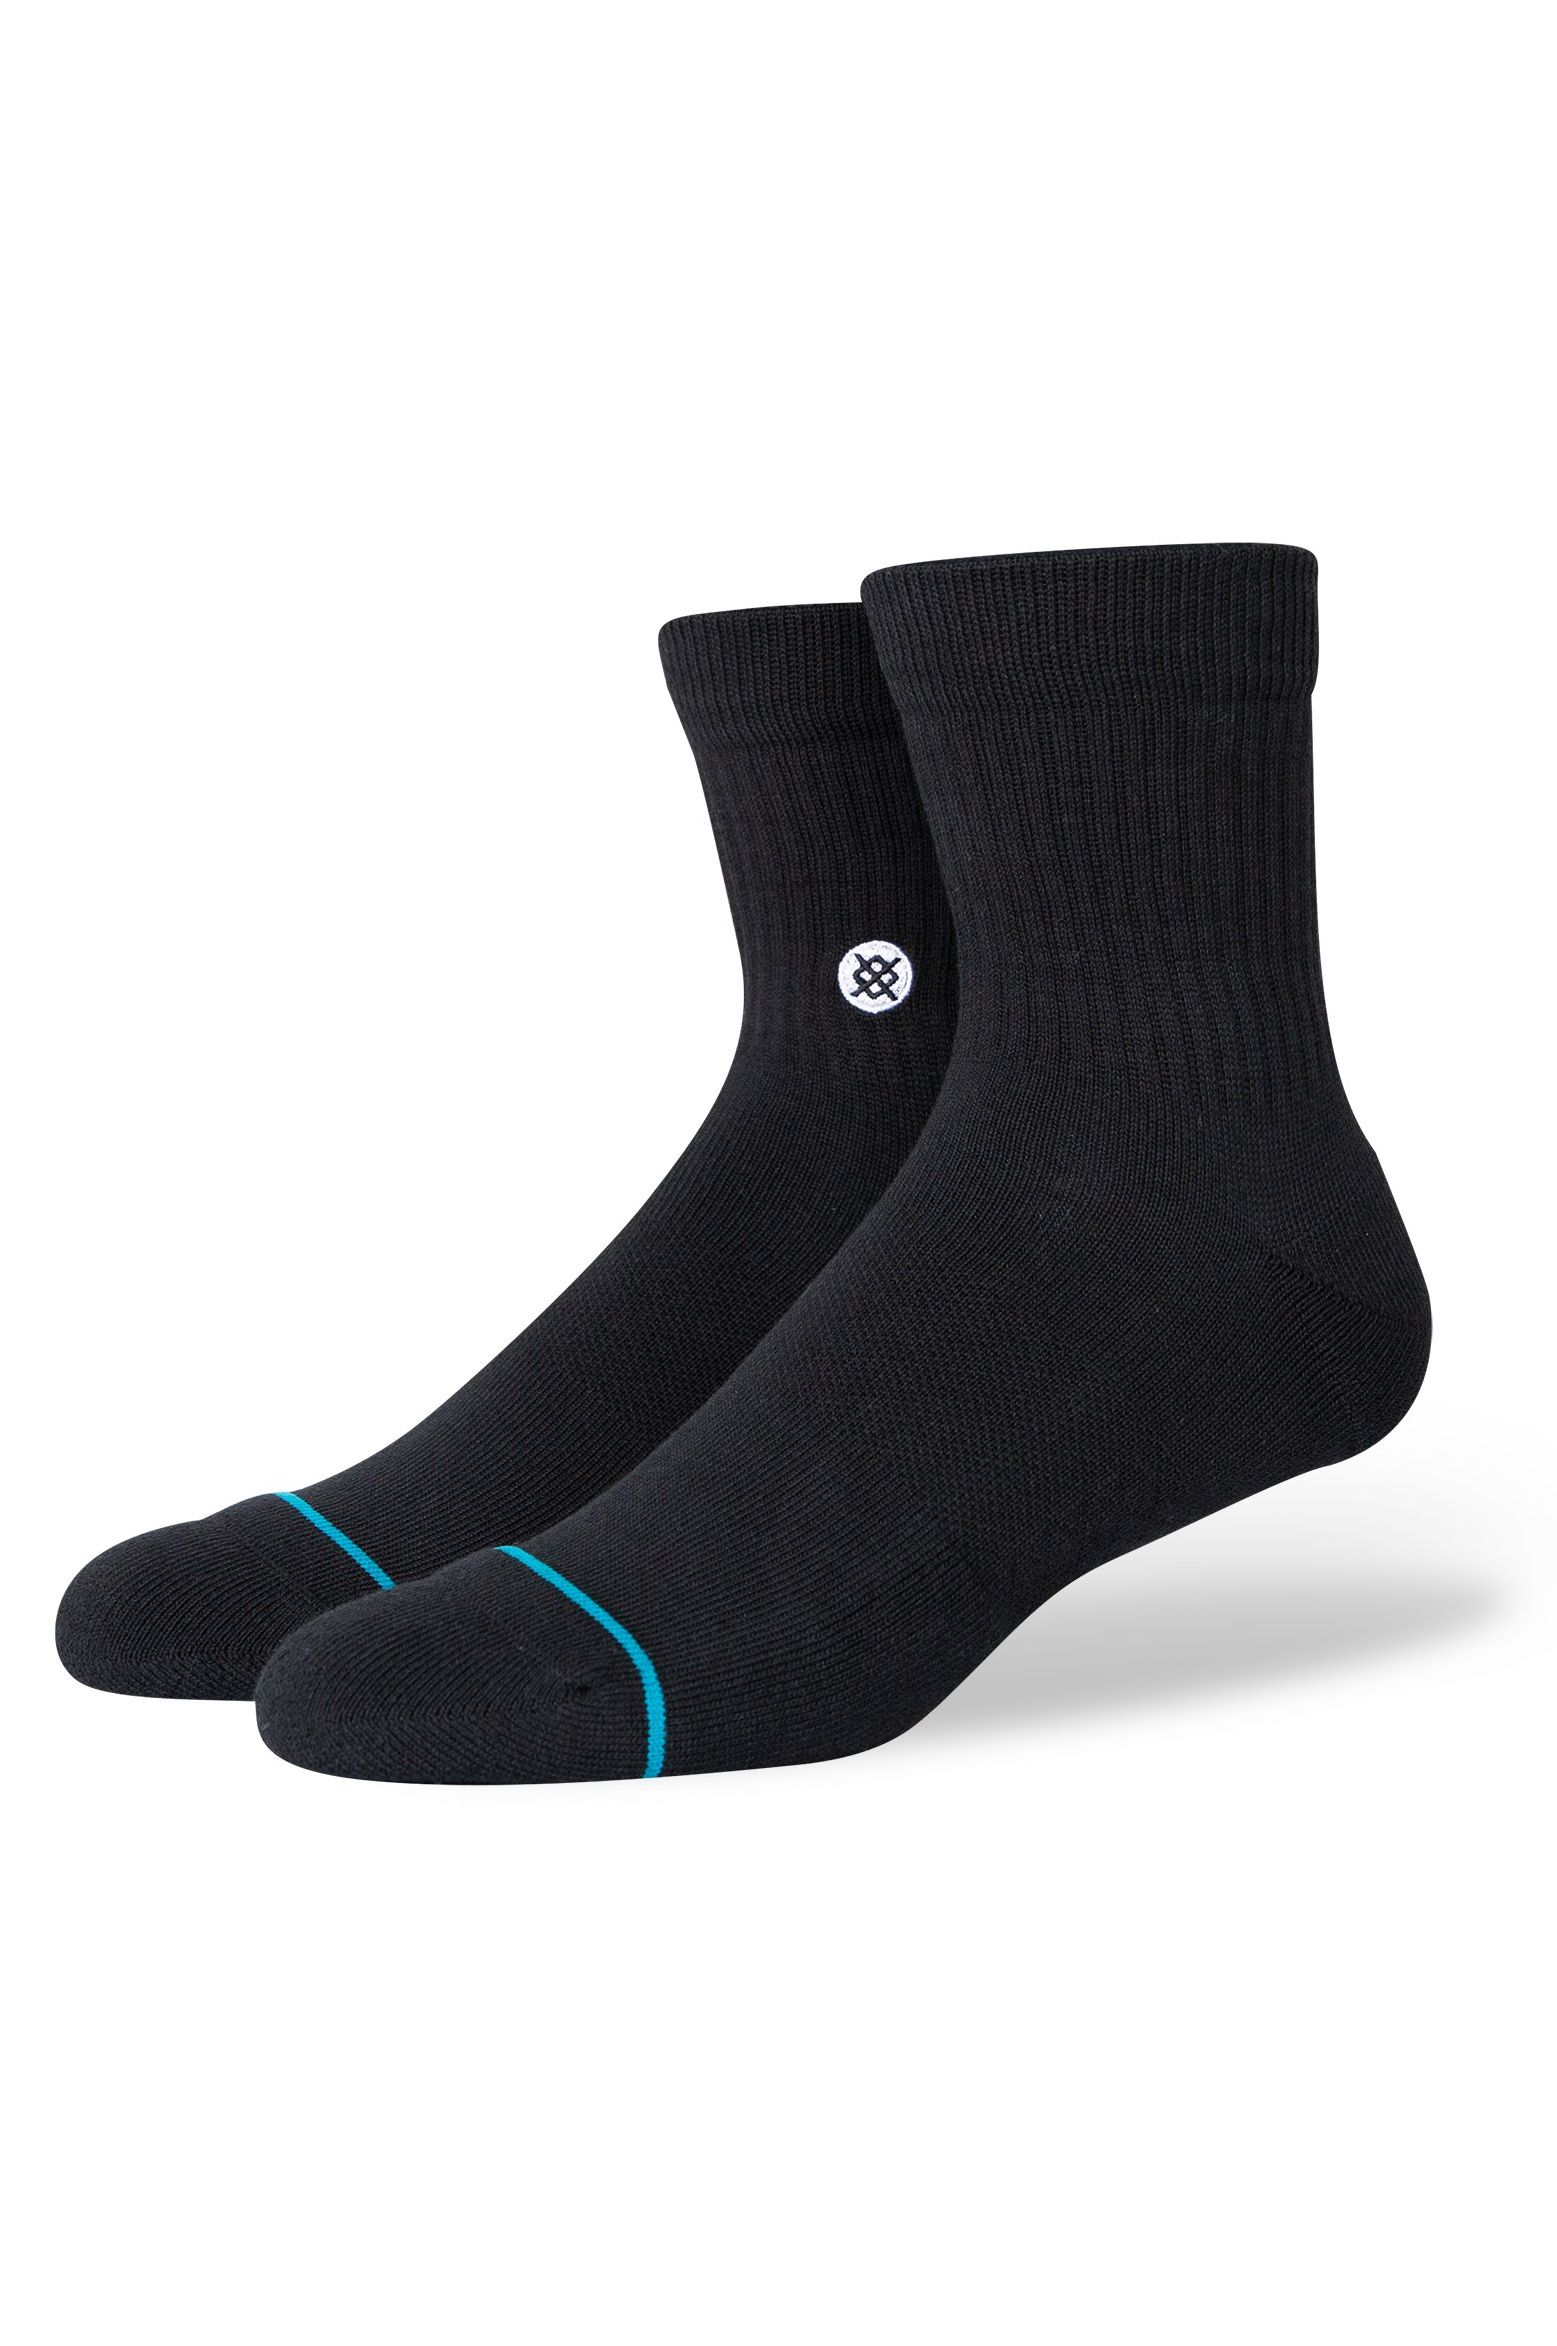 Stance Socks ICON QUARTER Black